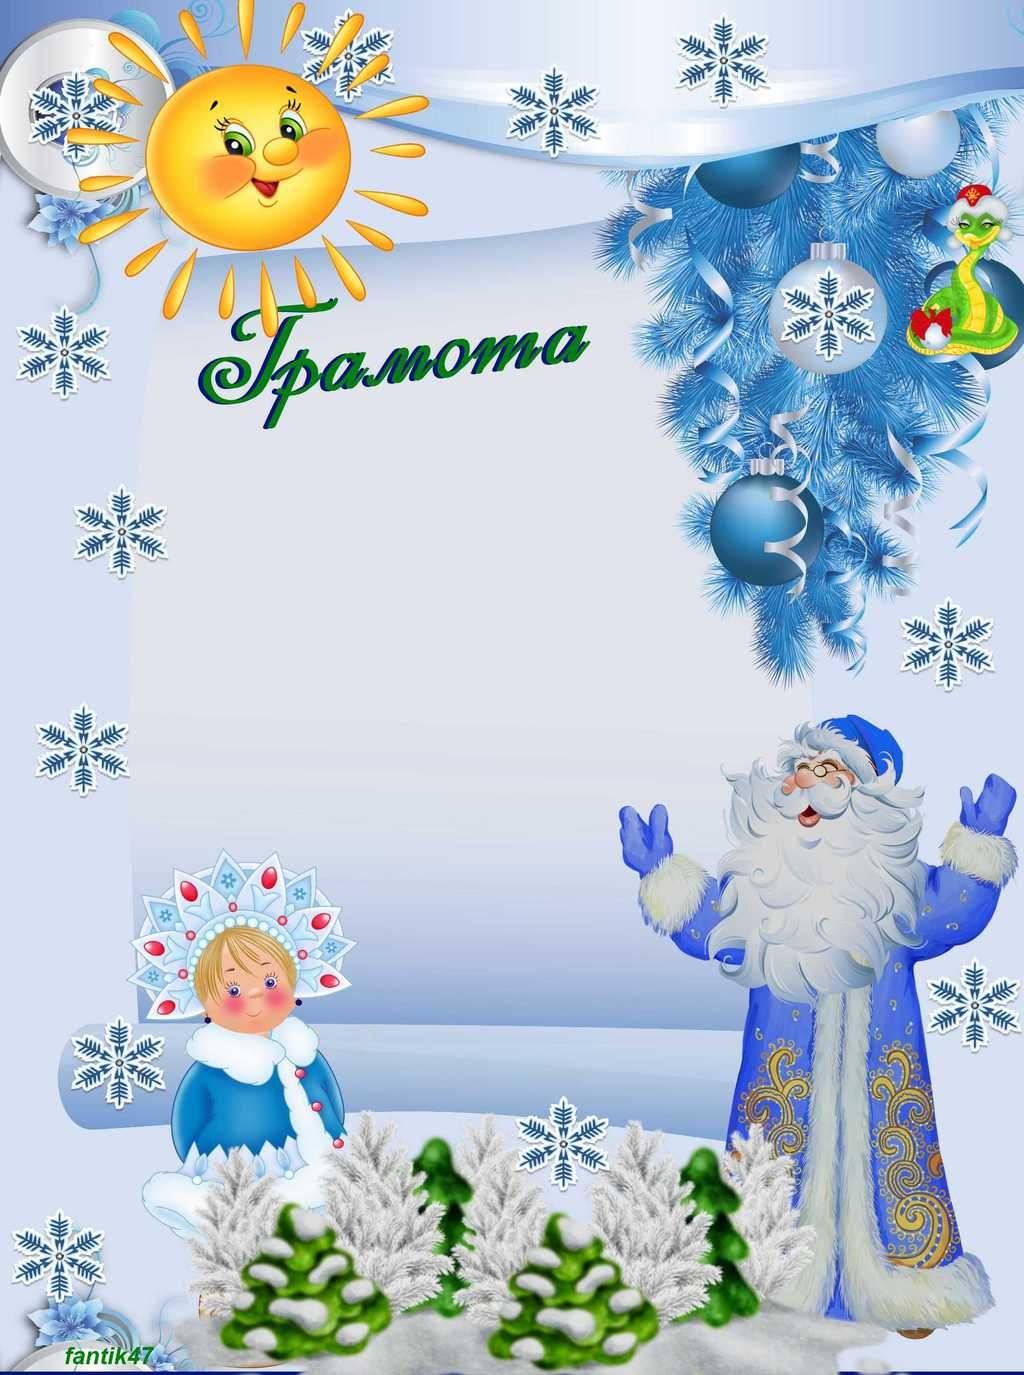 Грамоты шаблоны для детей новый год